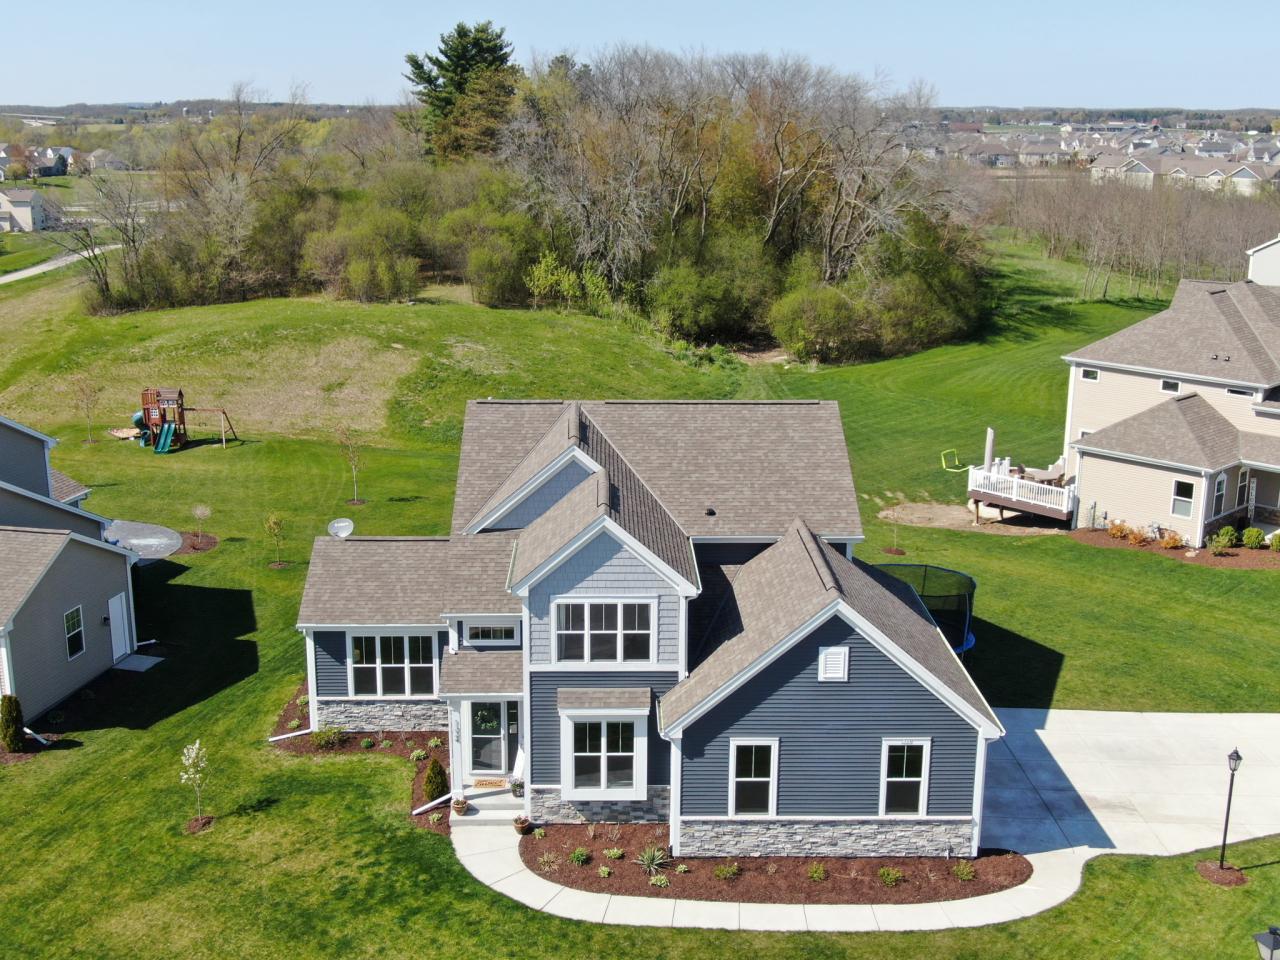 1324 Pine Ridge Dr, Oconomowoc, Wisconsin 53066, 4 Bedrooms Bedrooms, 9 Rooms Rooms,2 BathroomsBathrooms,Single-Family,For Sale,Pine Ridge Dr,1689039